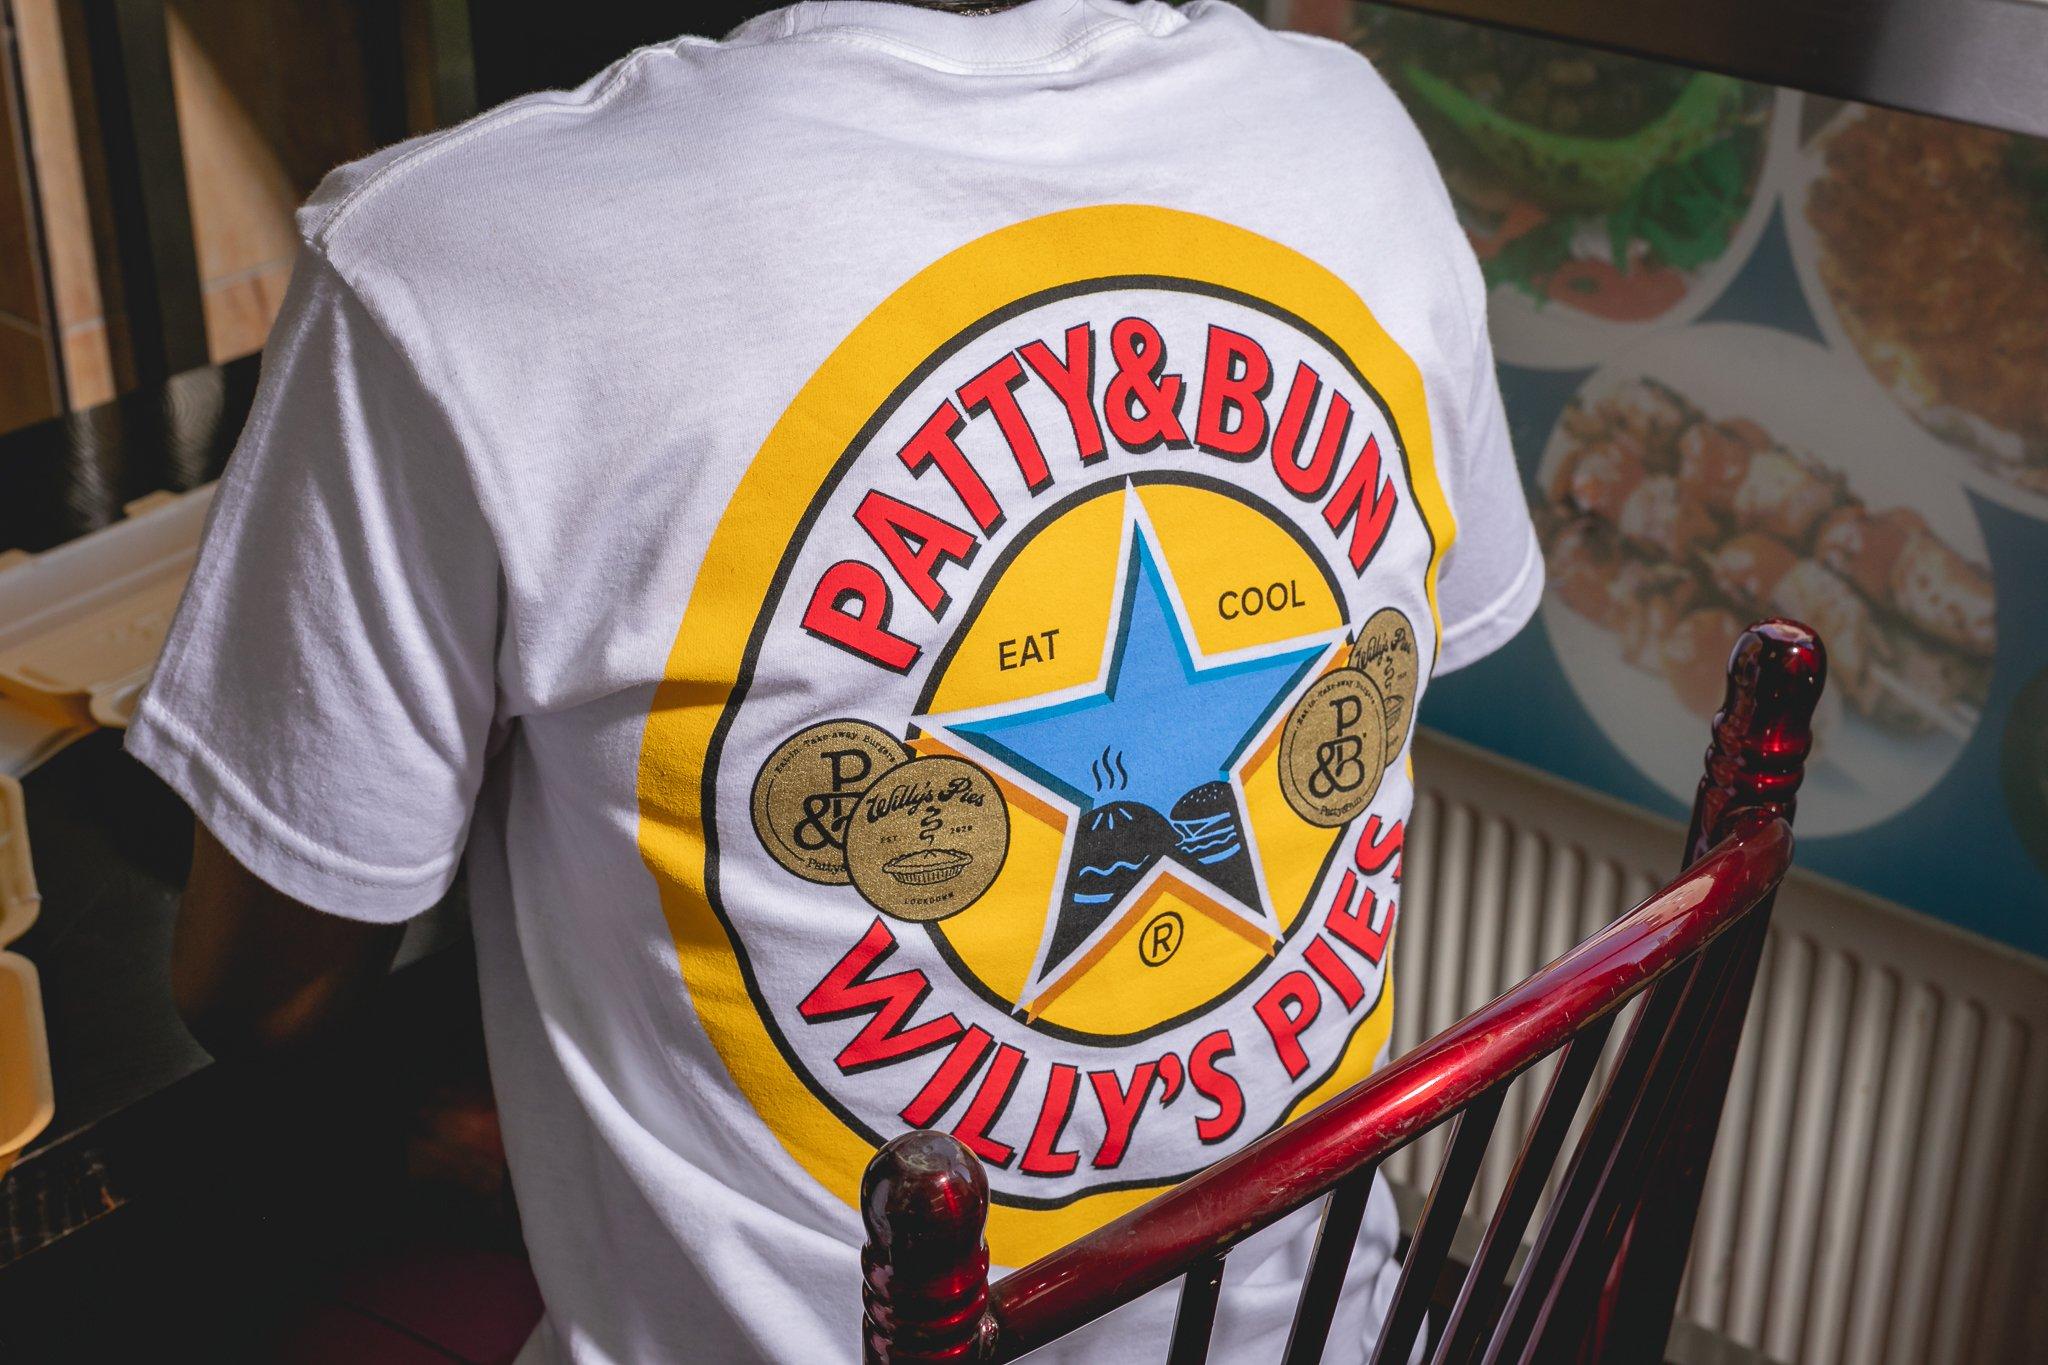 Willy's Pies x Patty&Bun NBA Tee